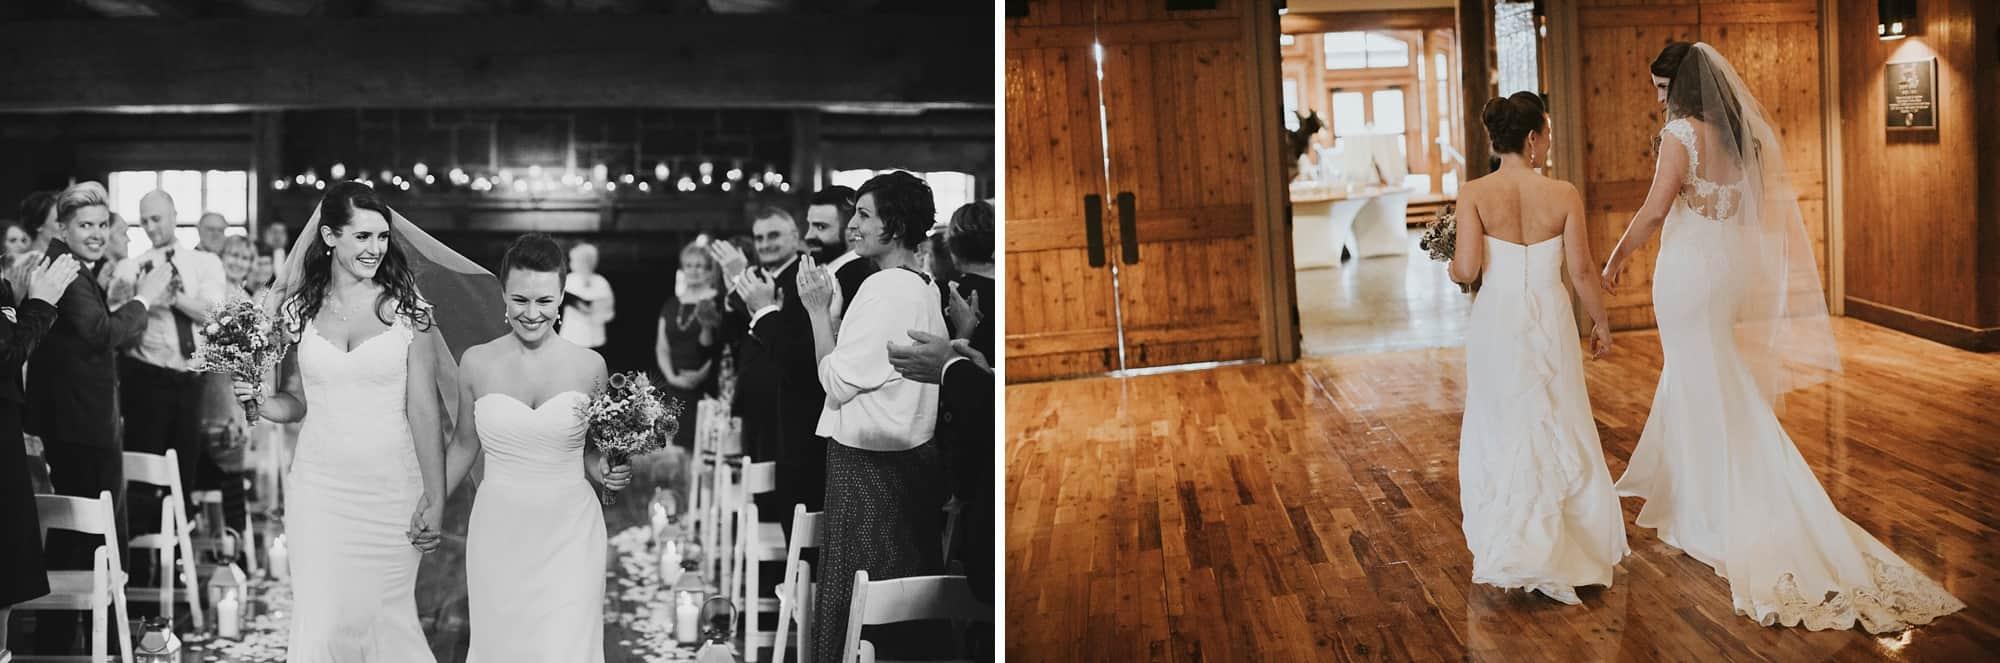 Sara Emily Sunriver Bend Oregon Rustic Lodge Wedding 0049